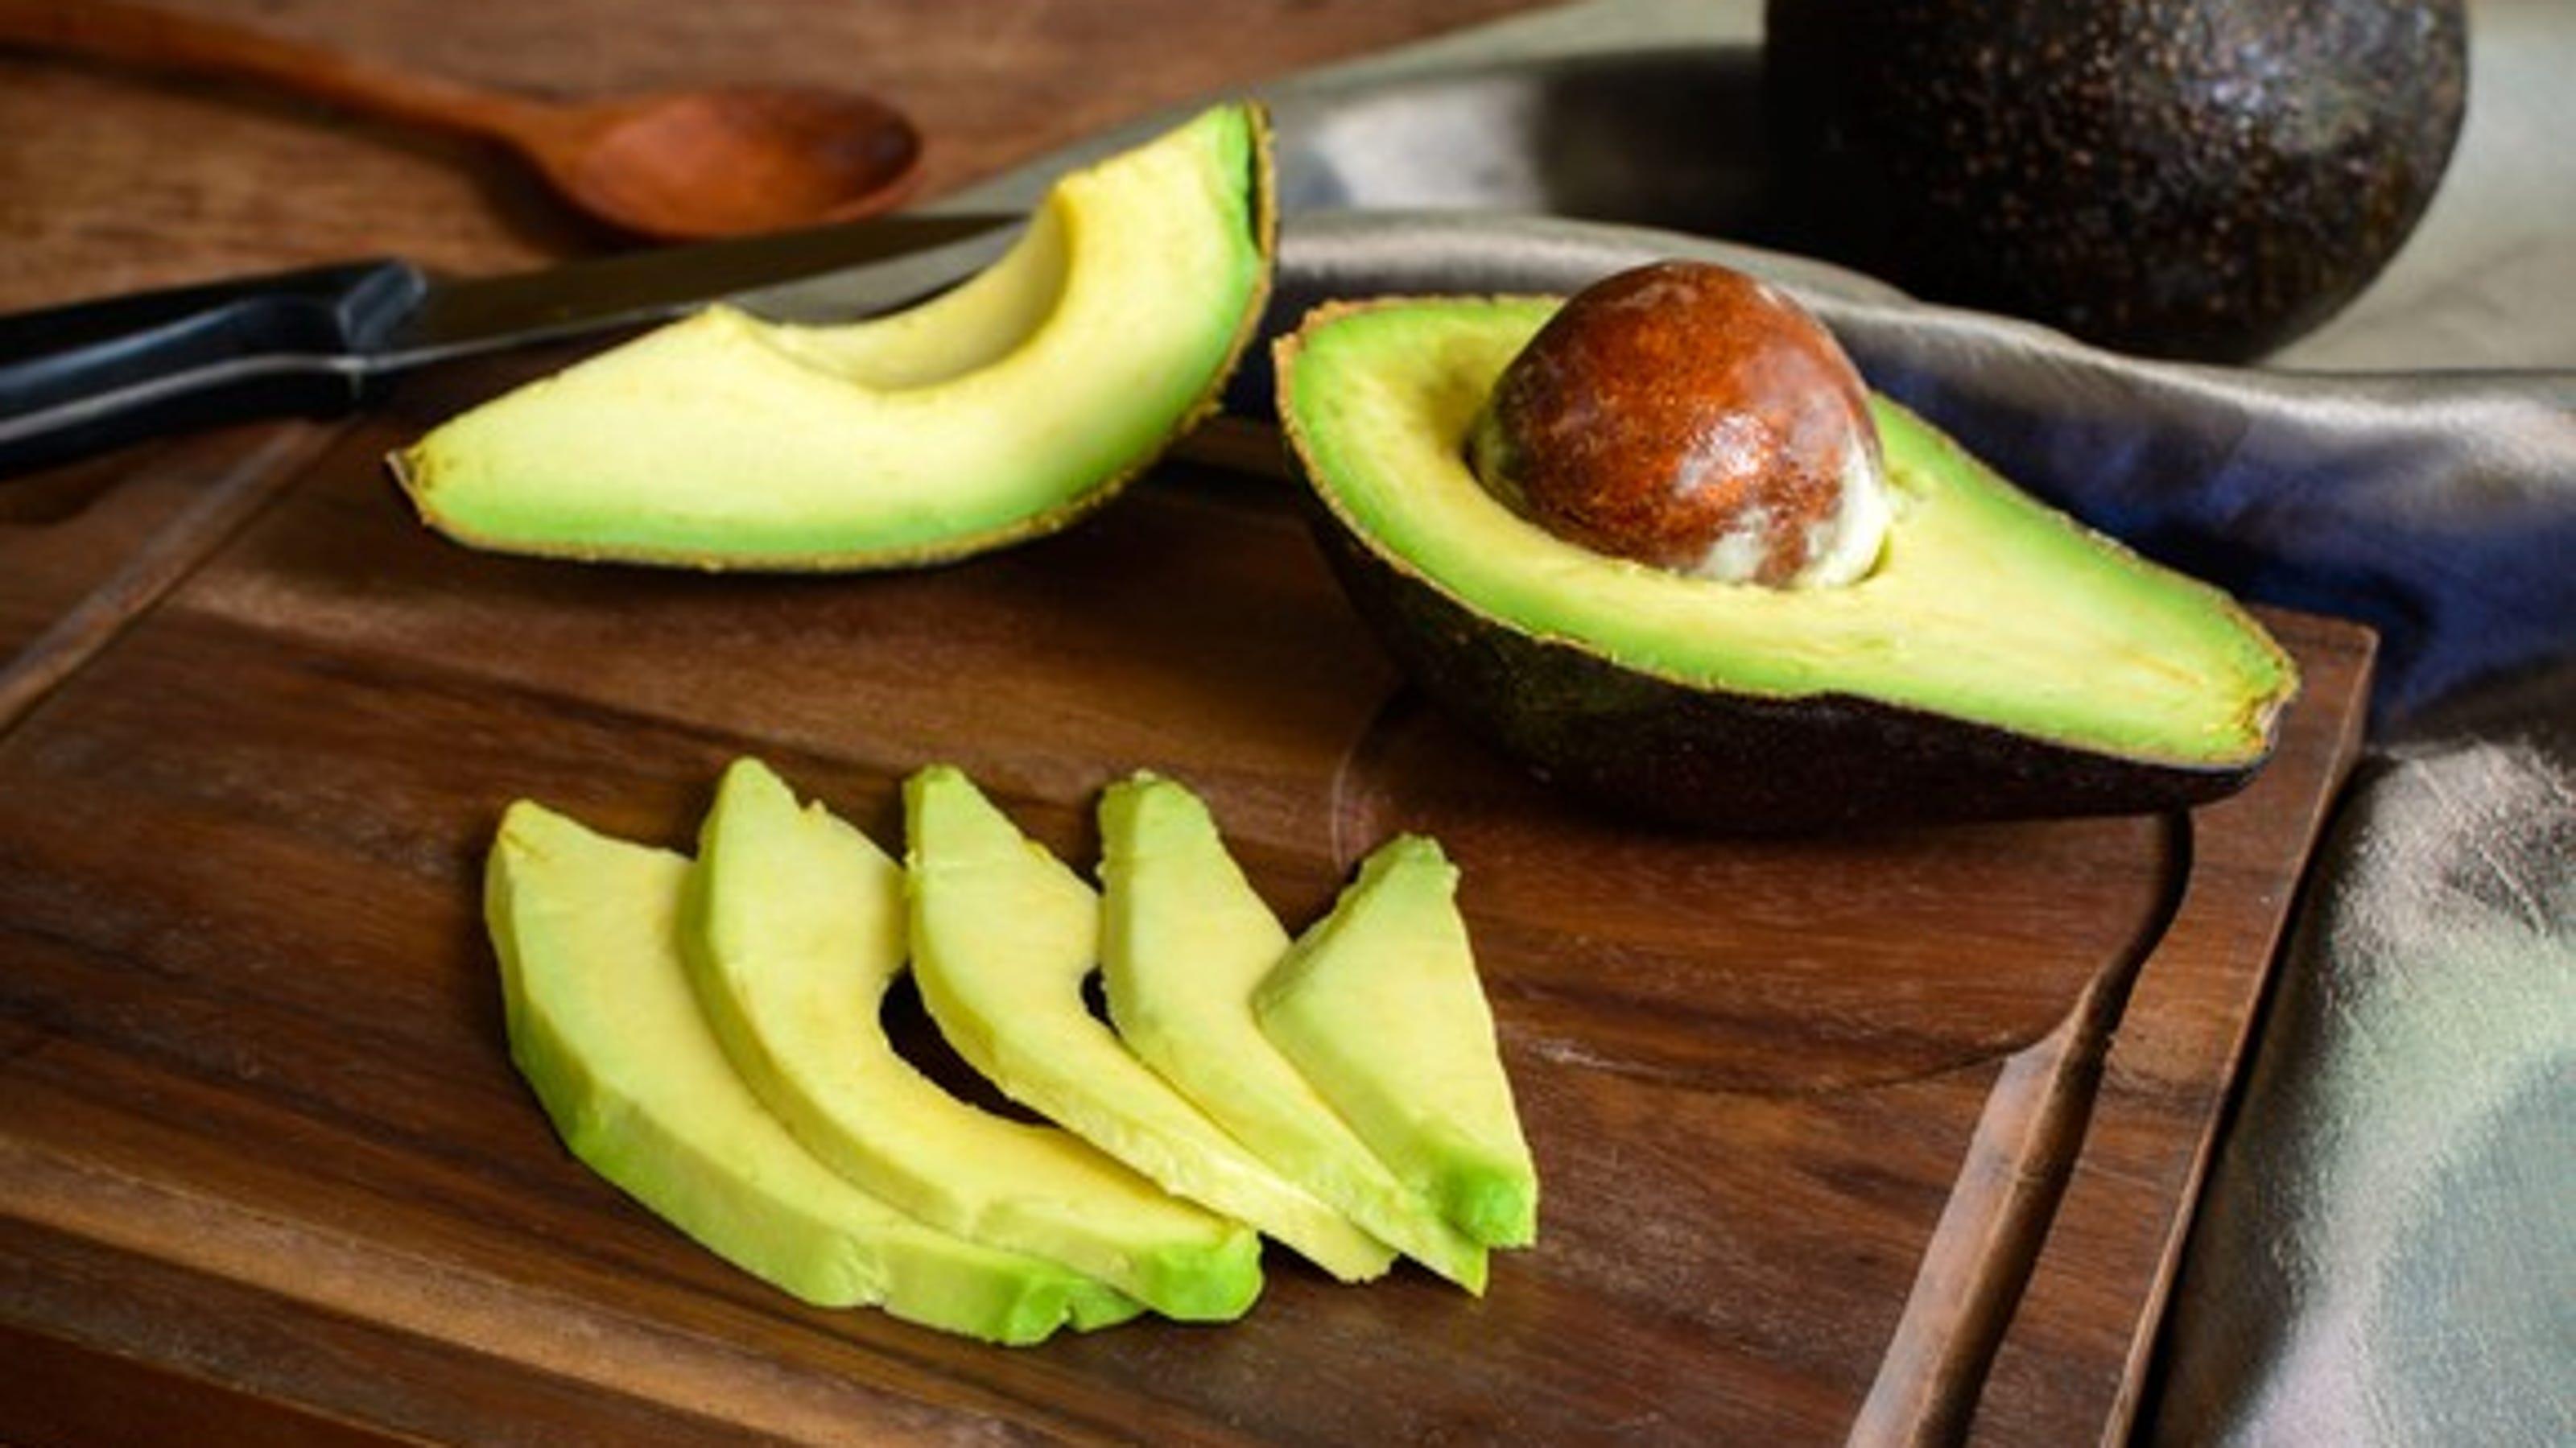 5 reasons dietitians hope the avocado craze never ends